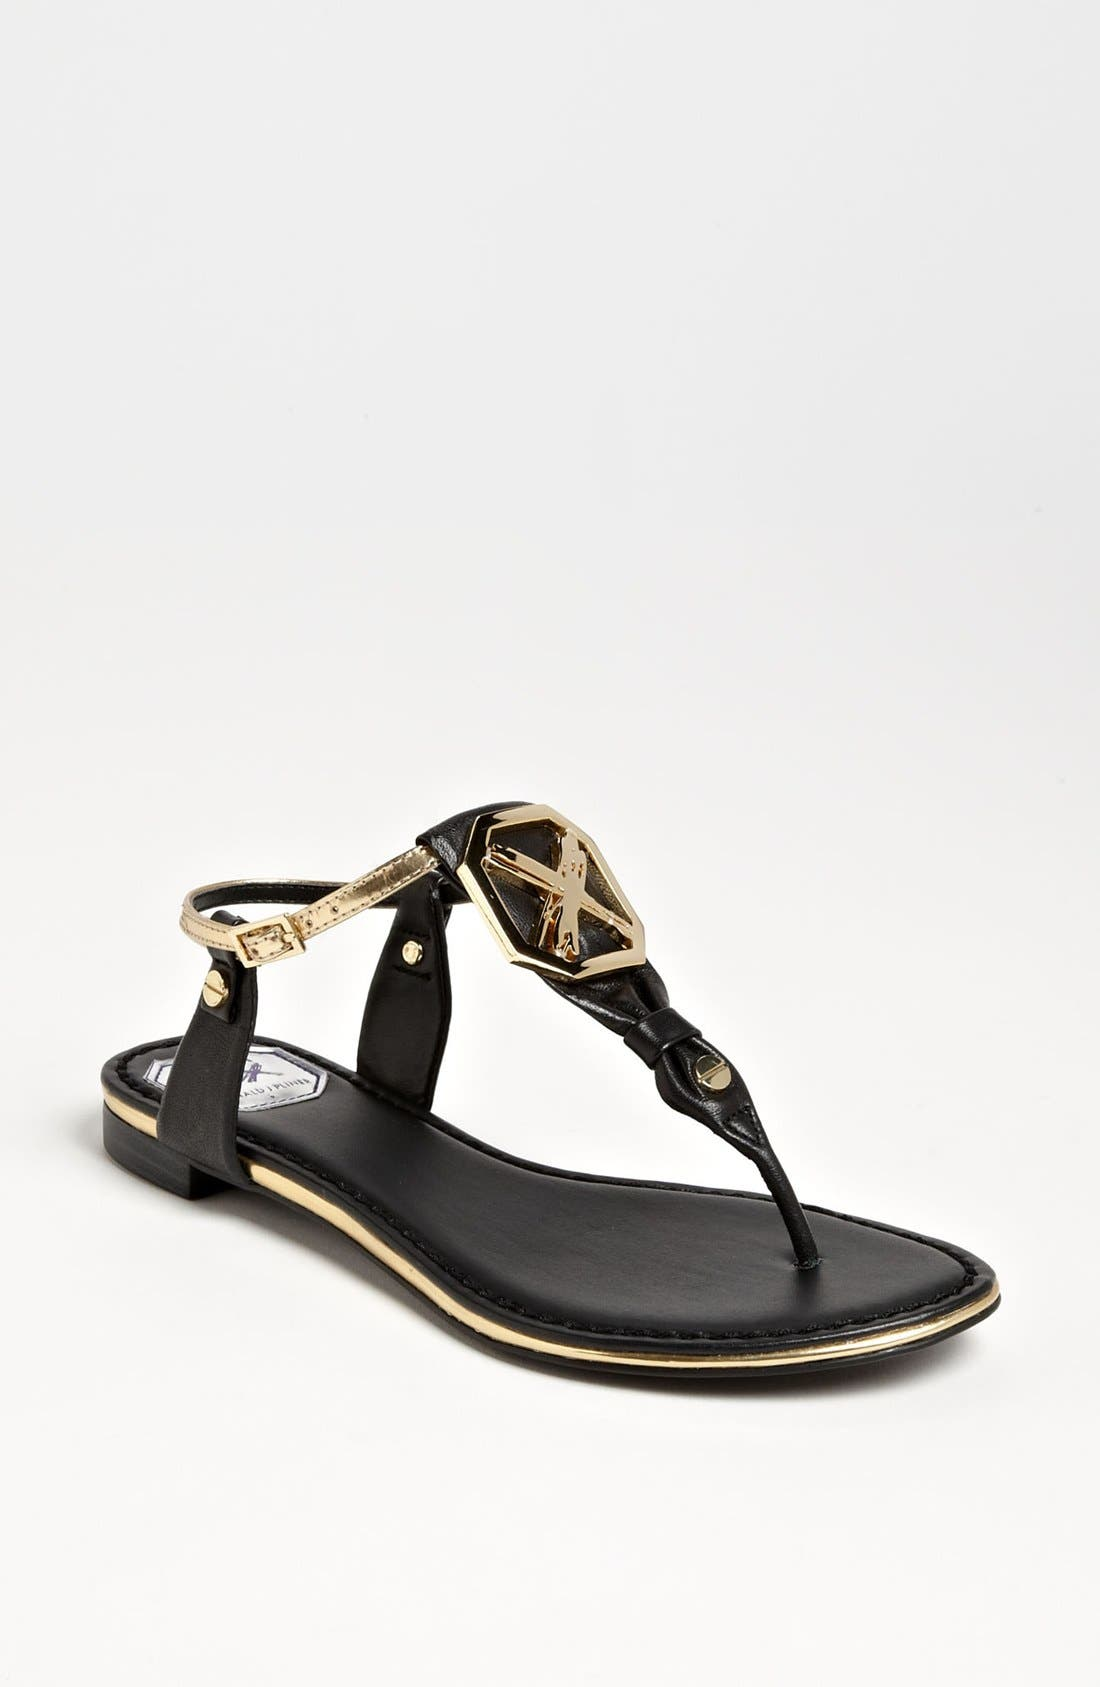 Main Image - DMSX Donald J Pliner 'Tray' Sandal